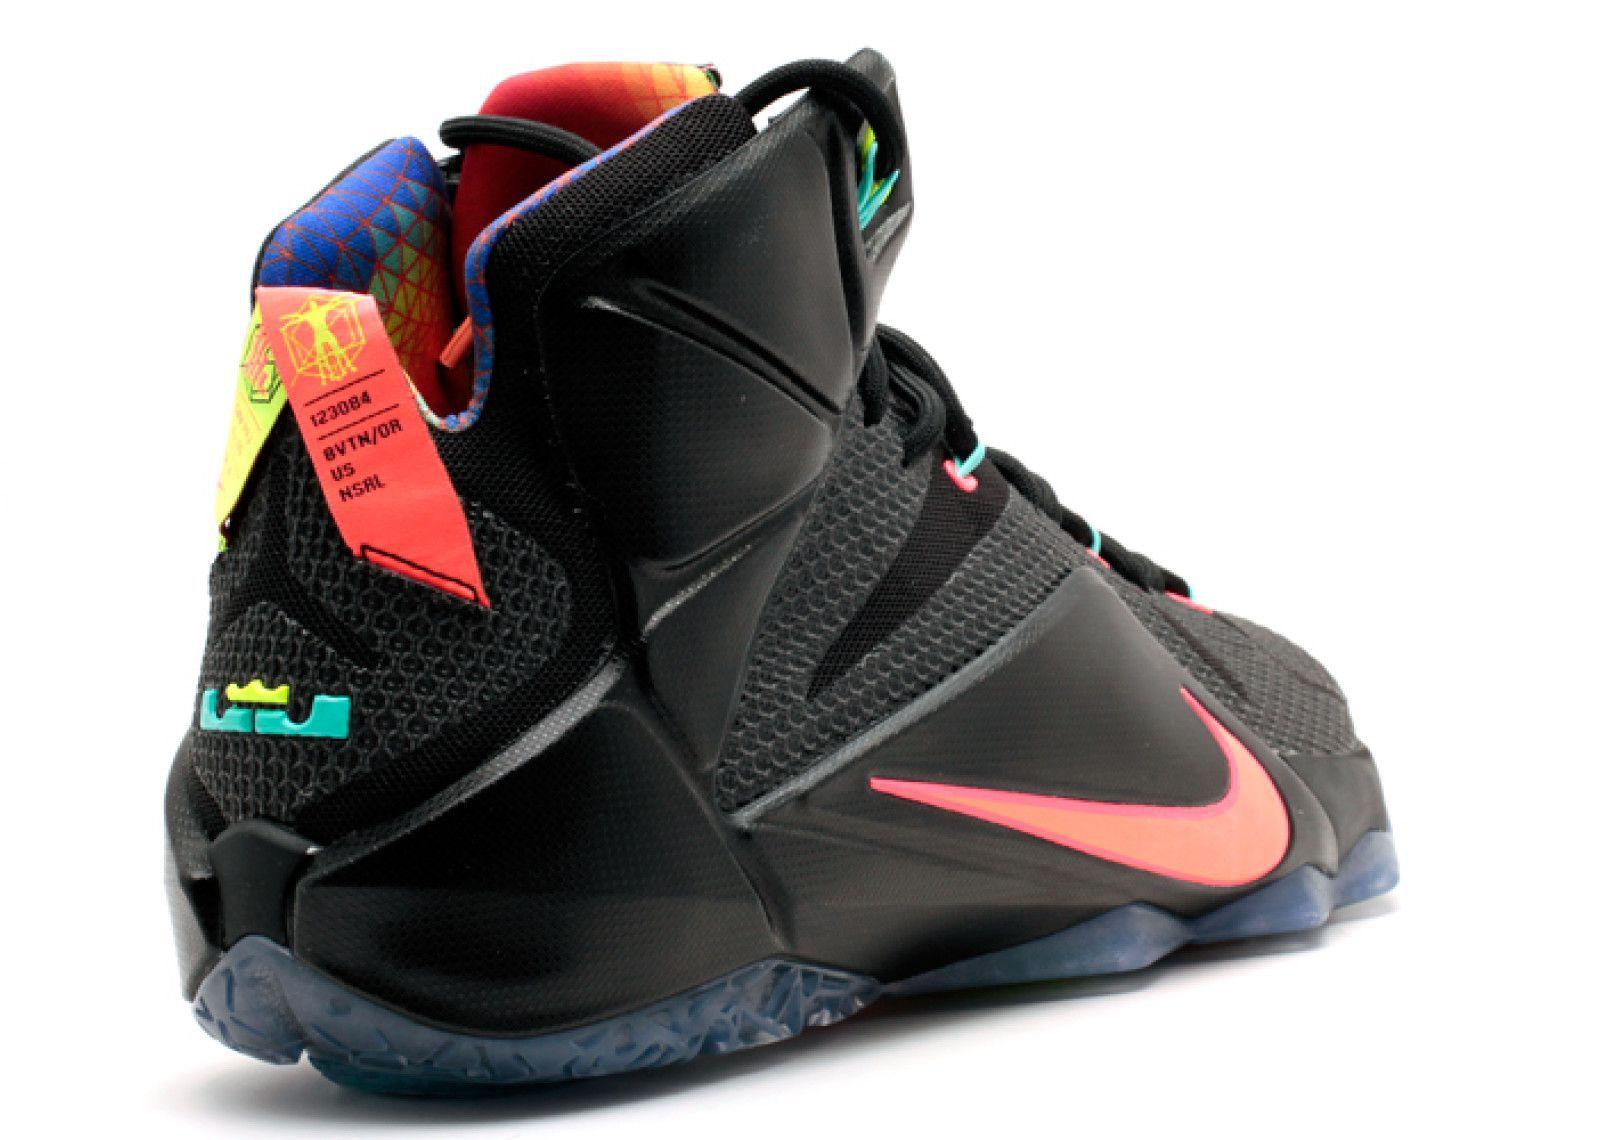 8b9a8b7d884c Nike Lebron 12 MNG Fashion Multi Color Basketball Shoes - Buy Nike ...